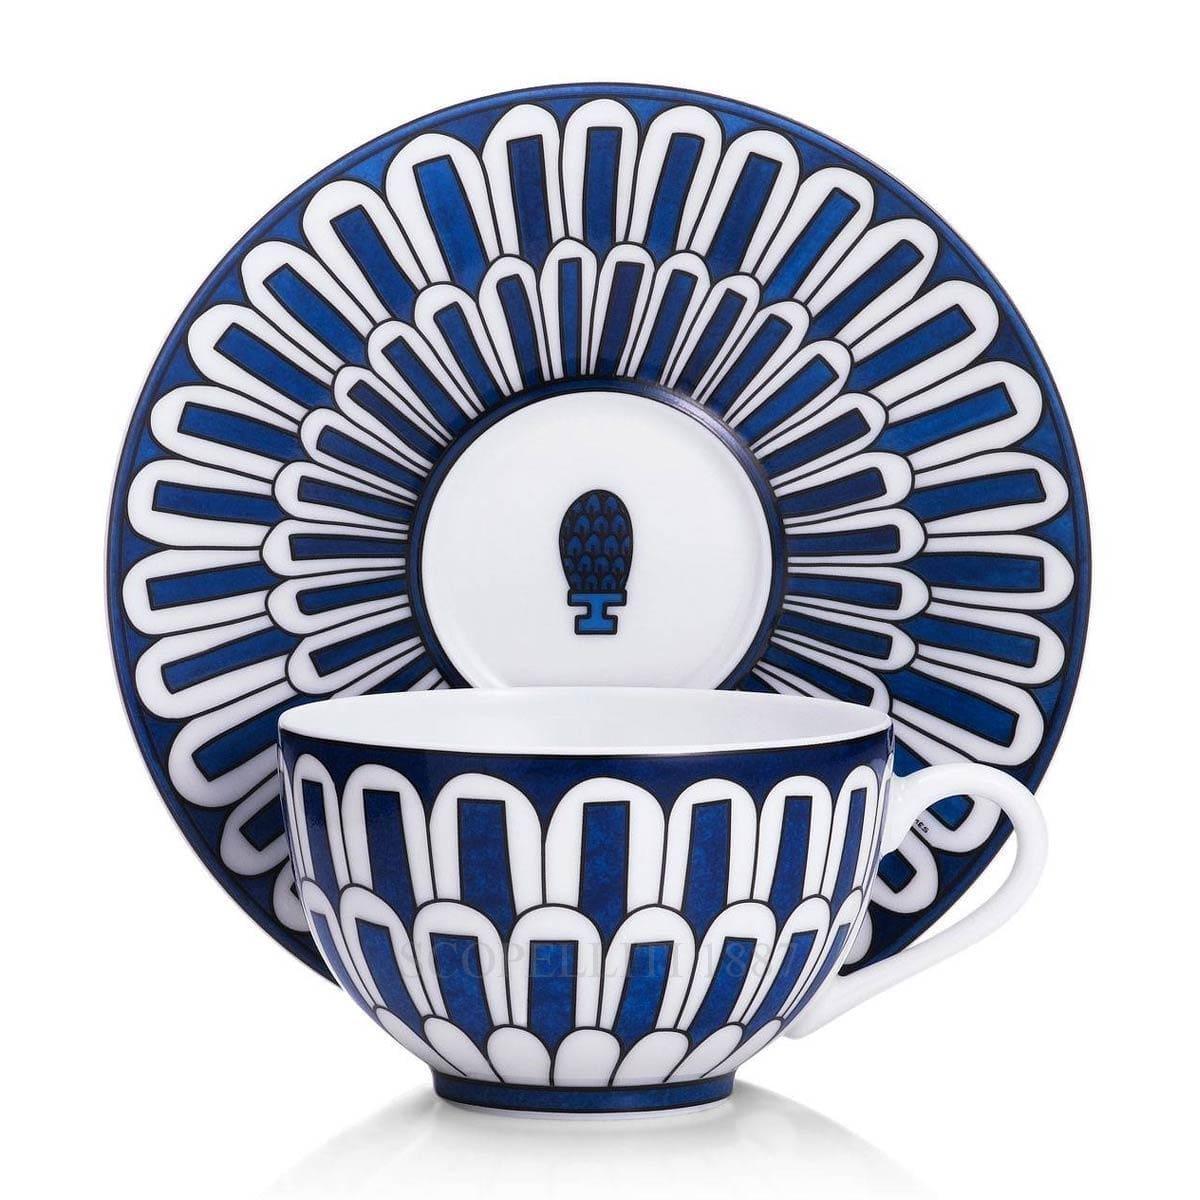 hermes paris bleus dailleurs designer porcelain teacup and saucer